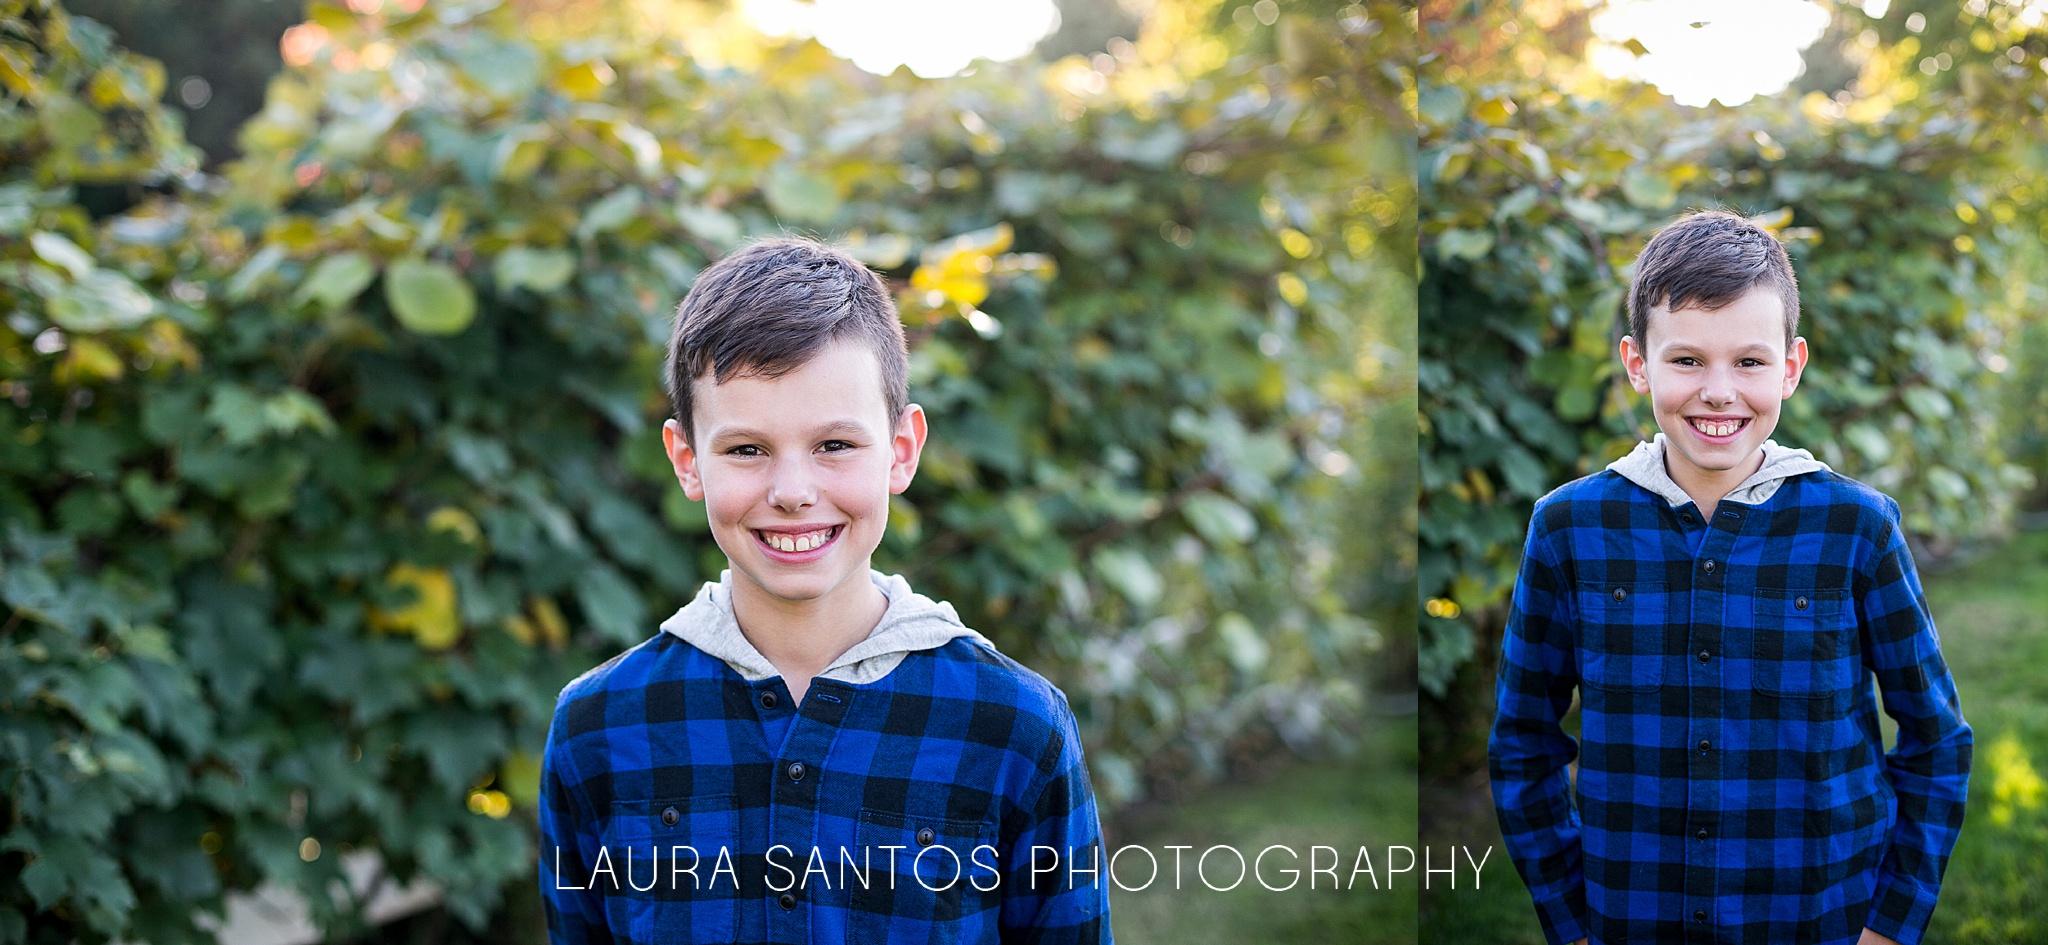 Laura Santos Photography Portland Oregon Family Photographer_0713.jpg